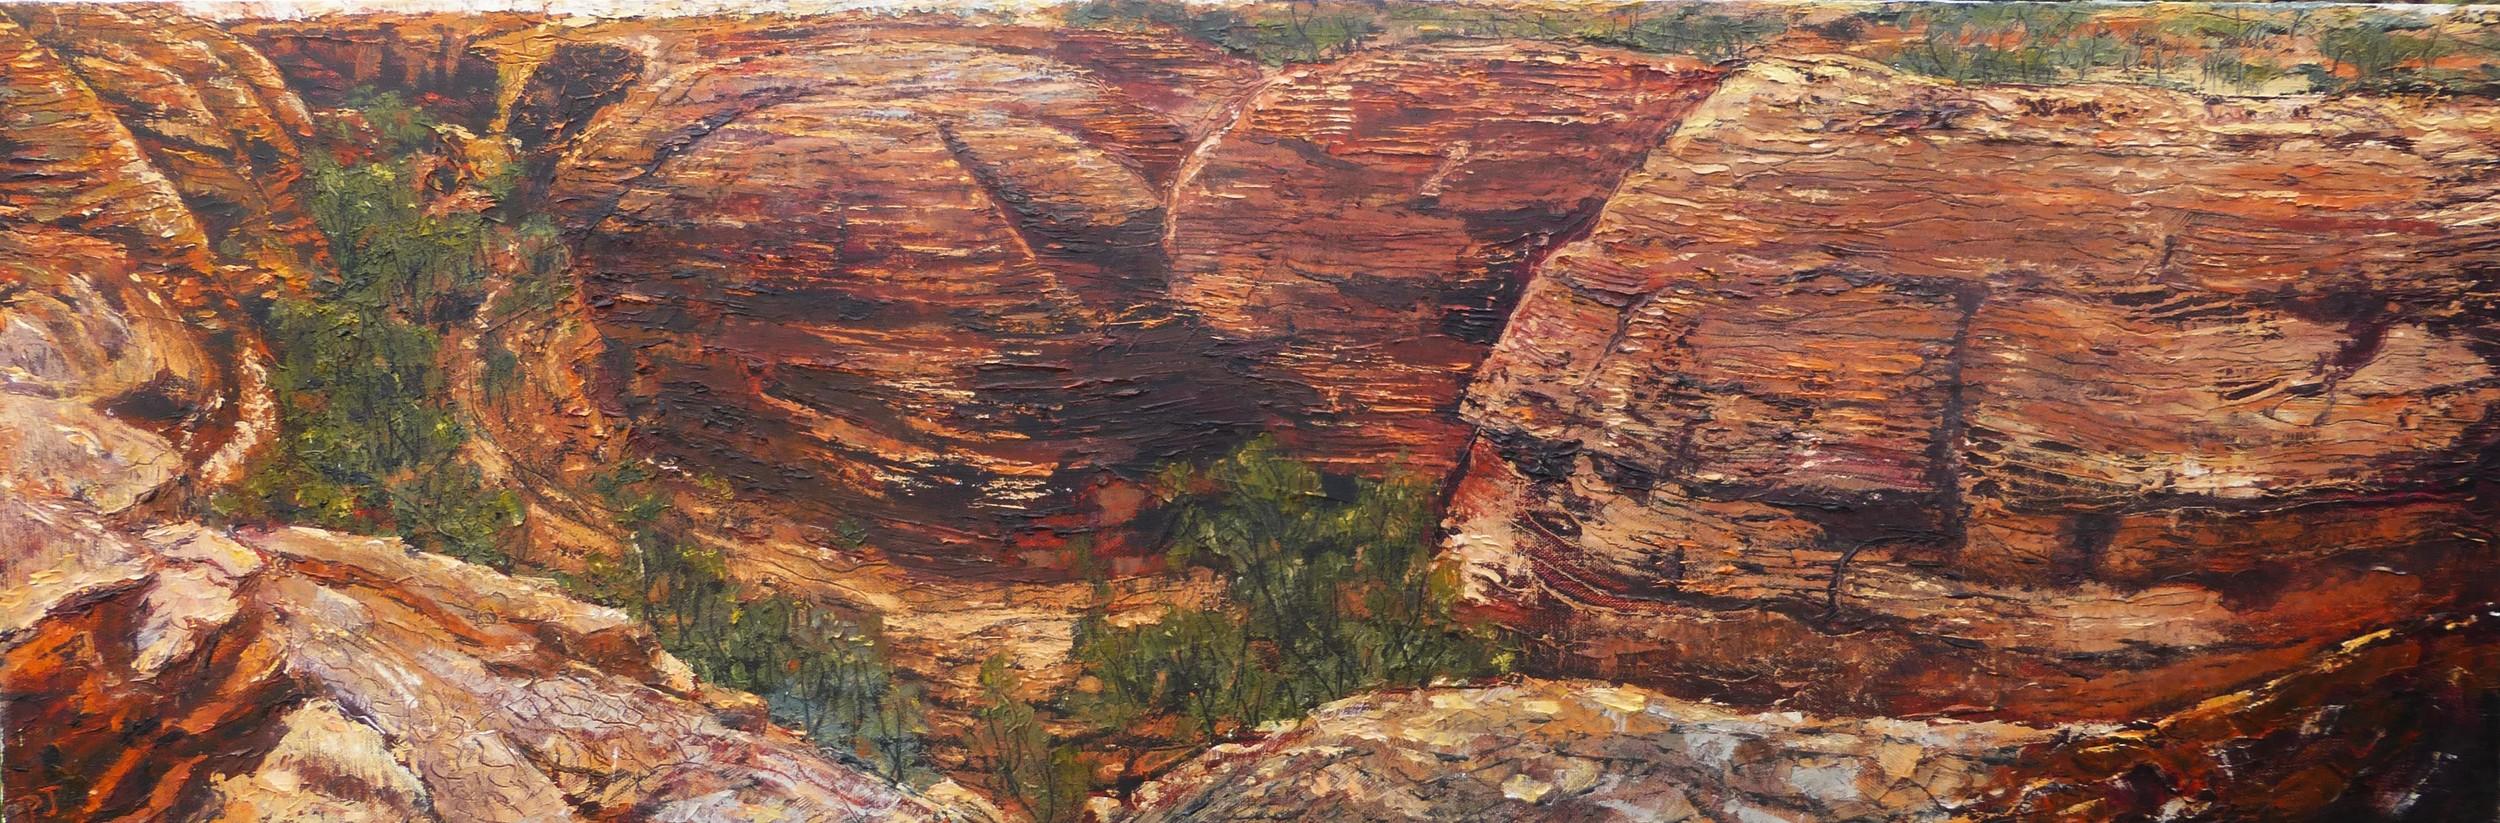 The Lost City, Australia, oil on canvas